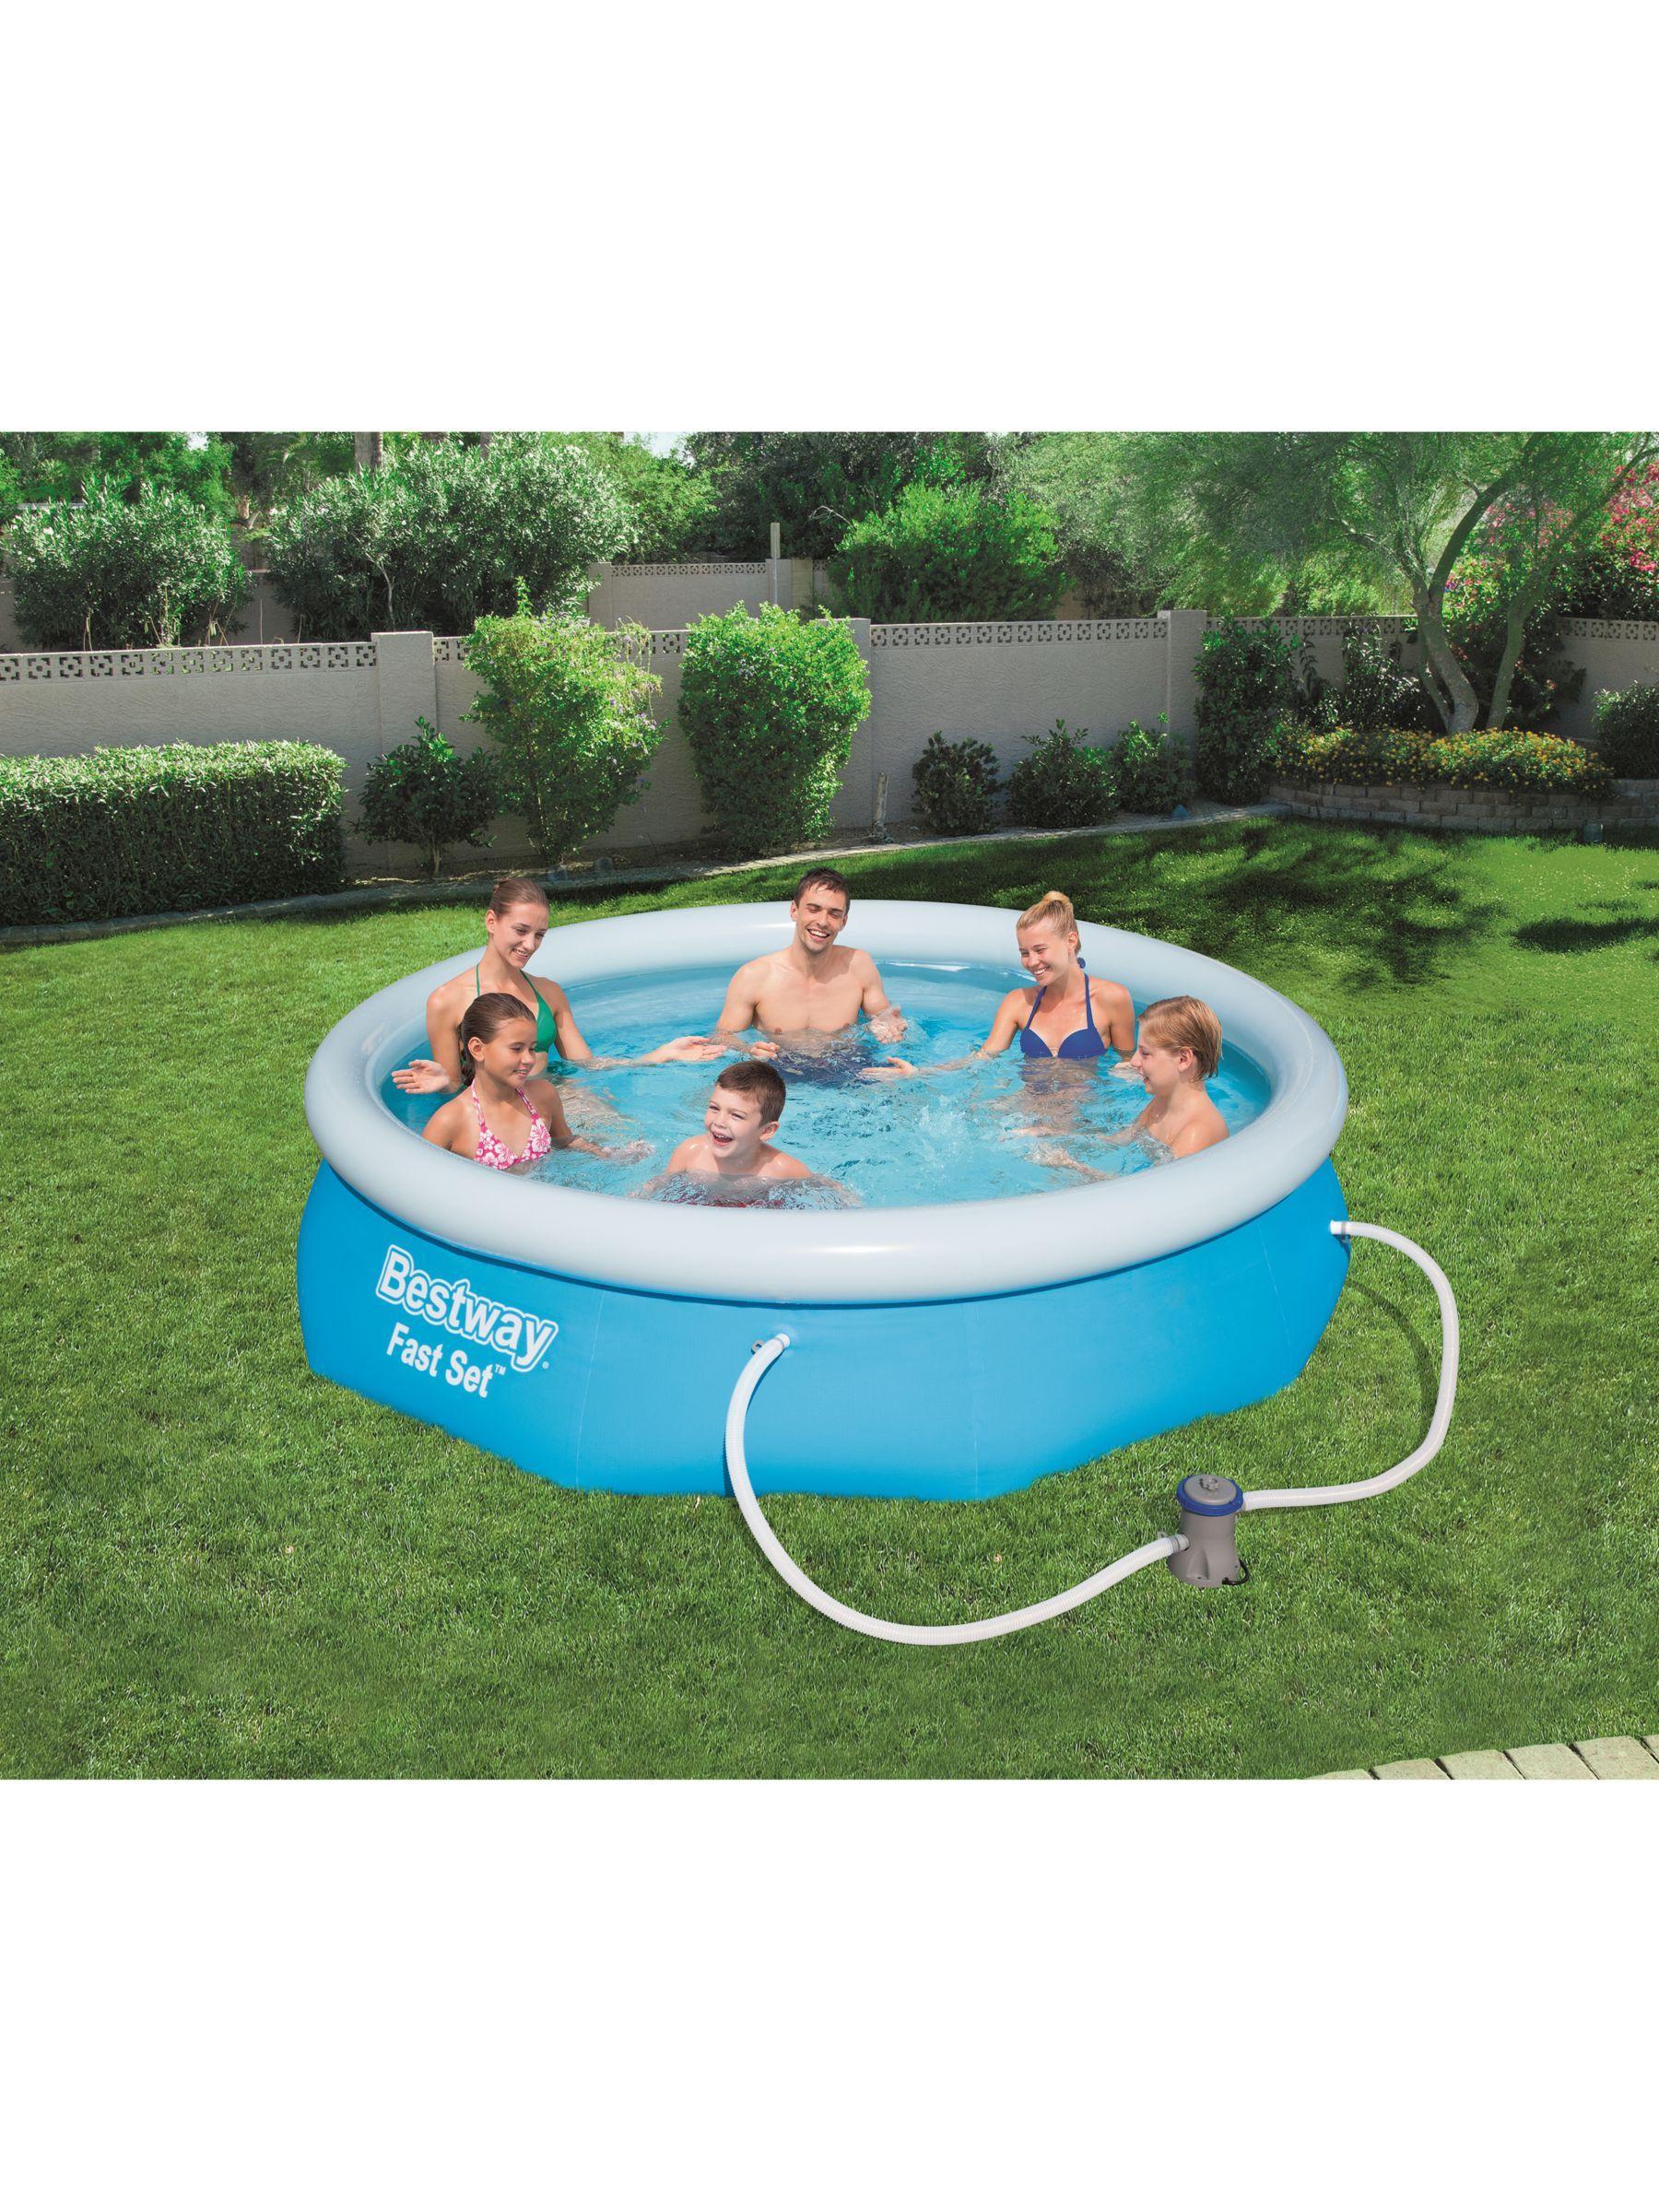 Bestway Fast Set Pool 10 X 30 Pool Family Inflatable Pool